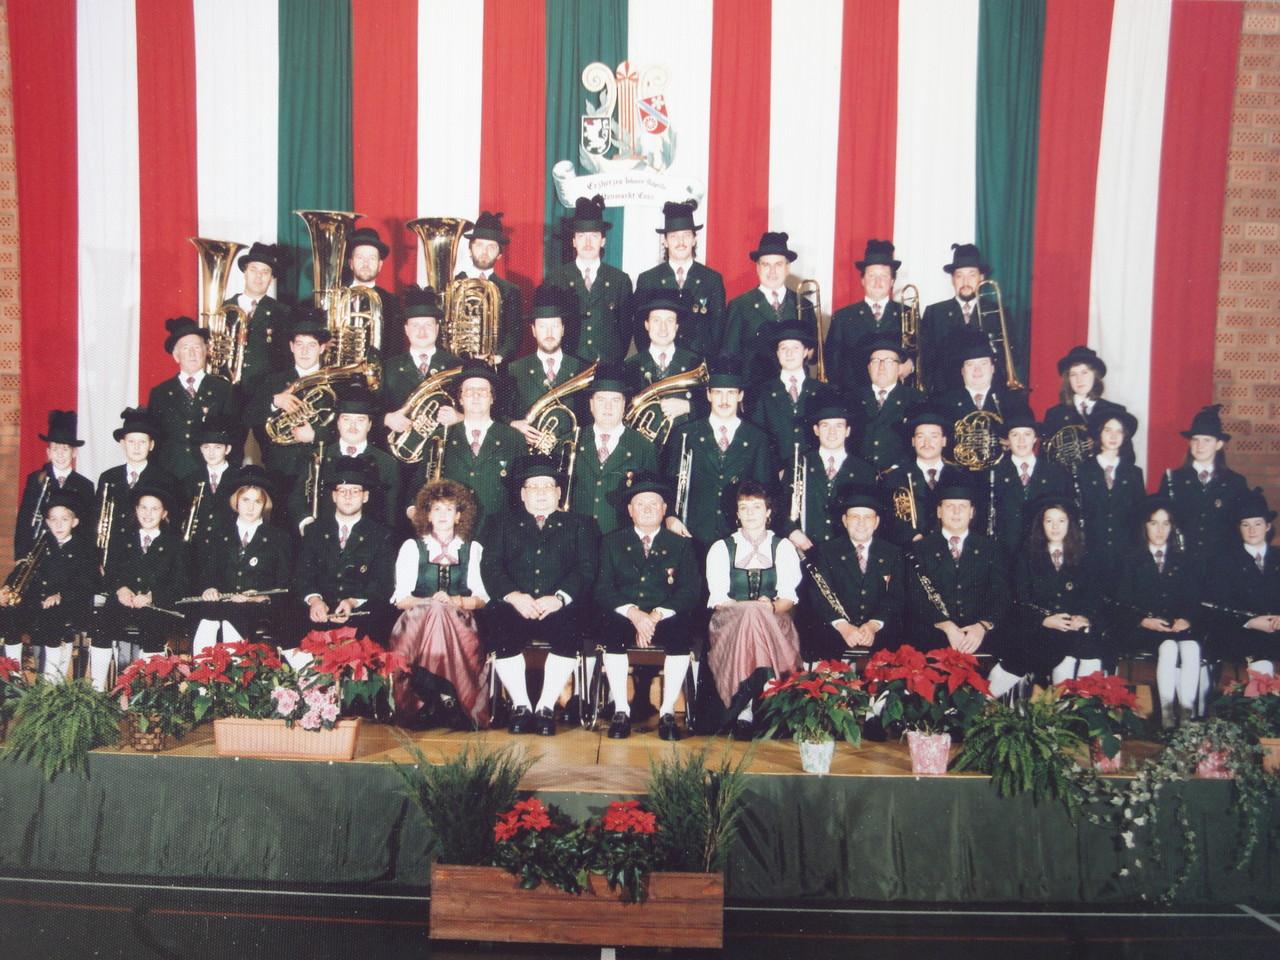 Erherzhog Johann Musikkapelle im Jahr 1993